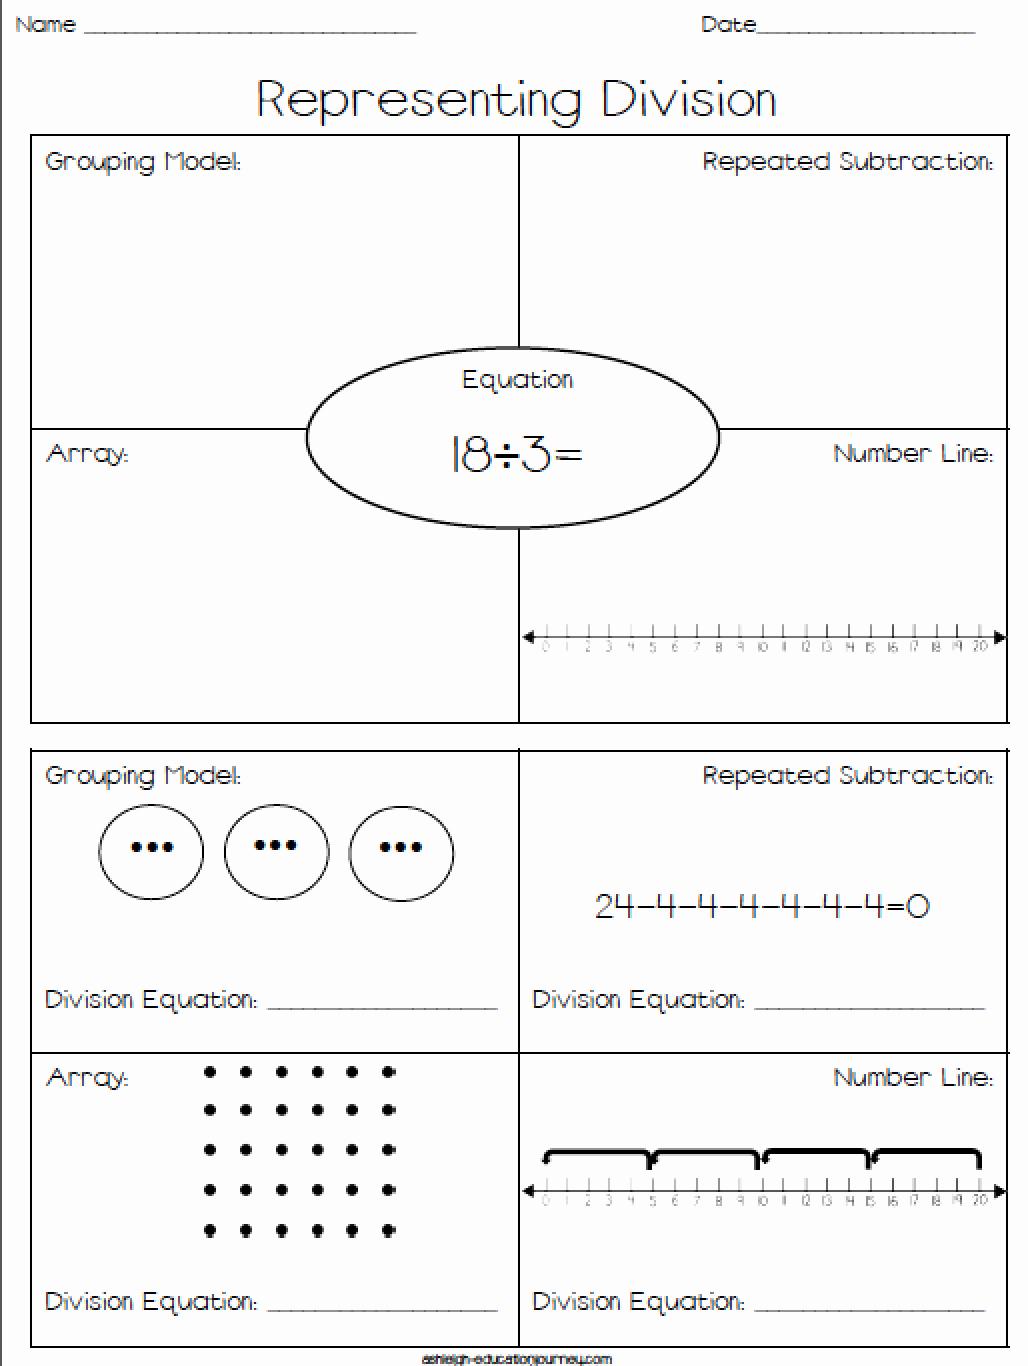 3rd Grade Number Line Worksheets Luxury Fraction Number Line Worksheets 3rd Grade